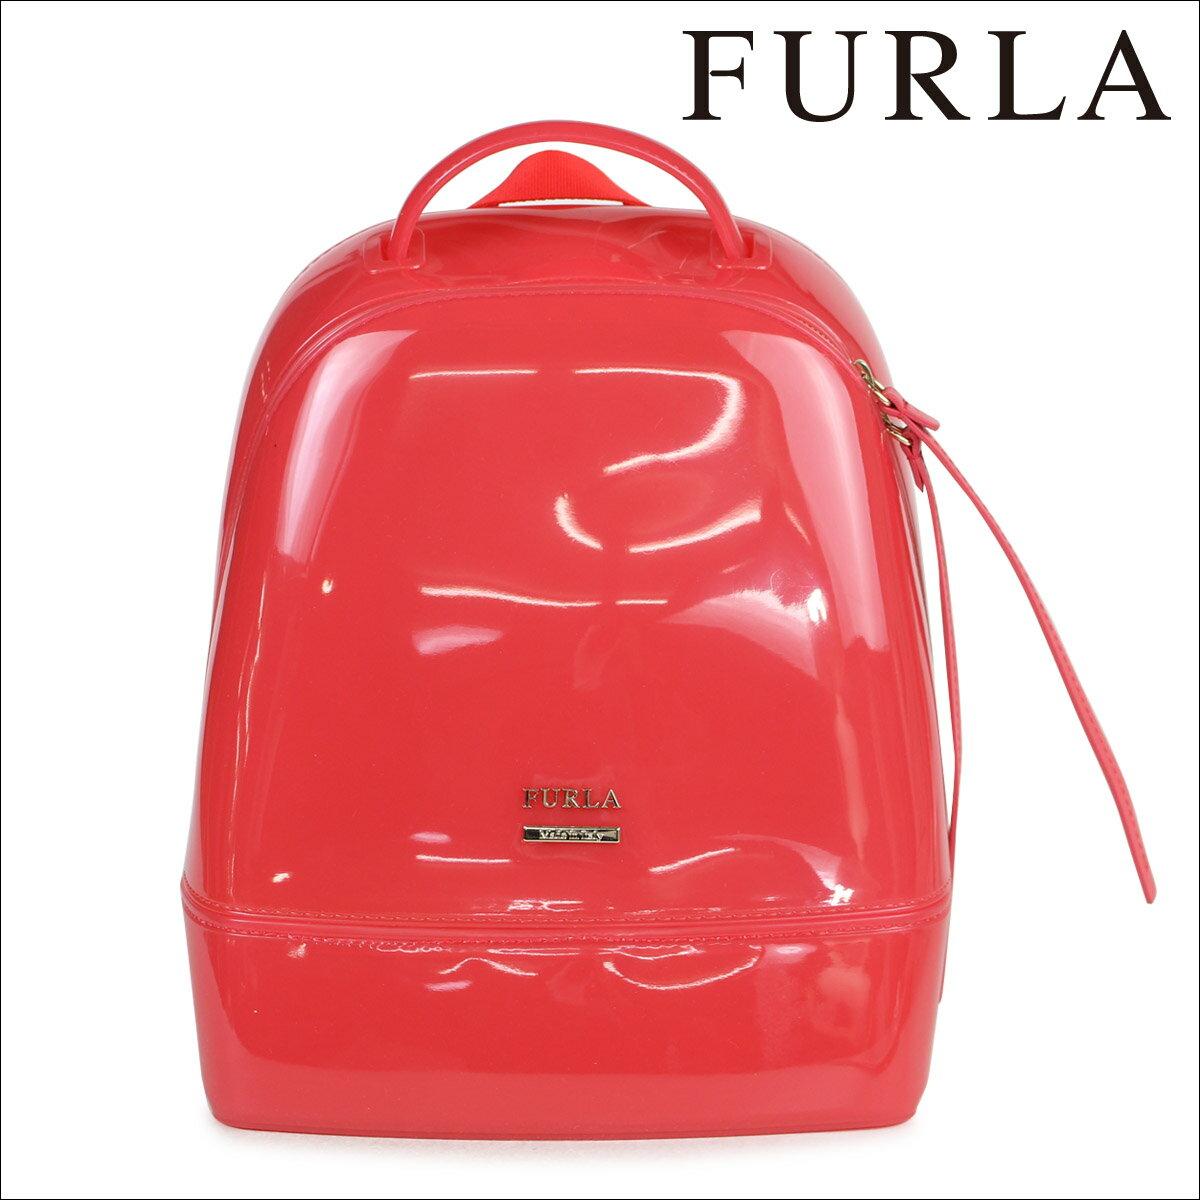 FURLA CANDY S BACK PACK RPSA フルラ バッグ リュック バックパック レディース ピンク 885218 [12/26 新入荷] [1712]